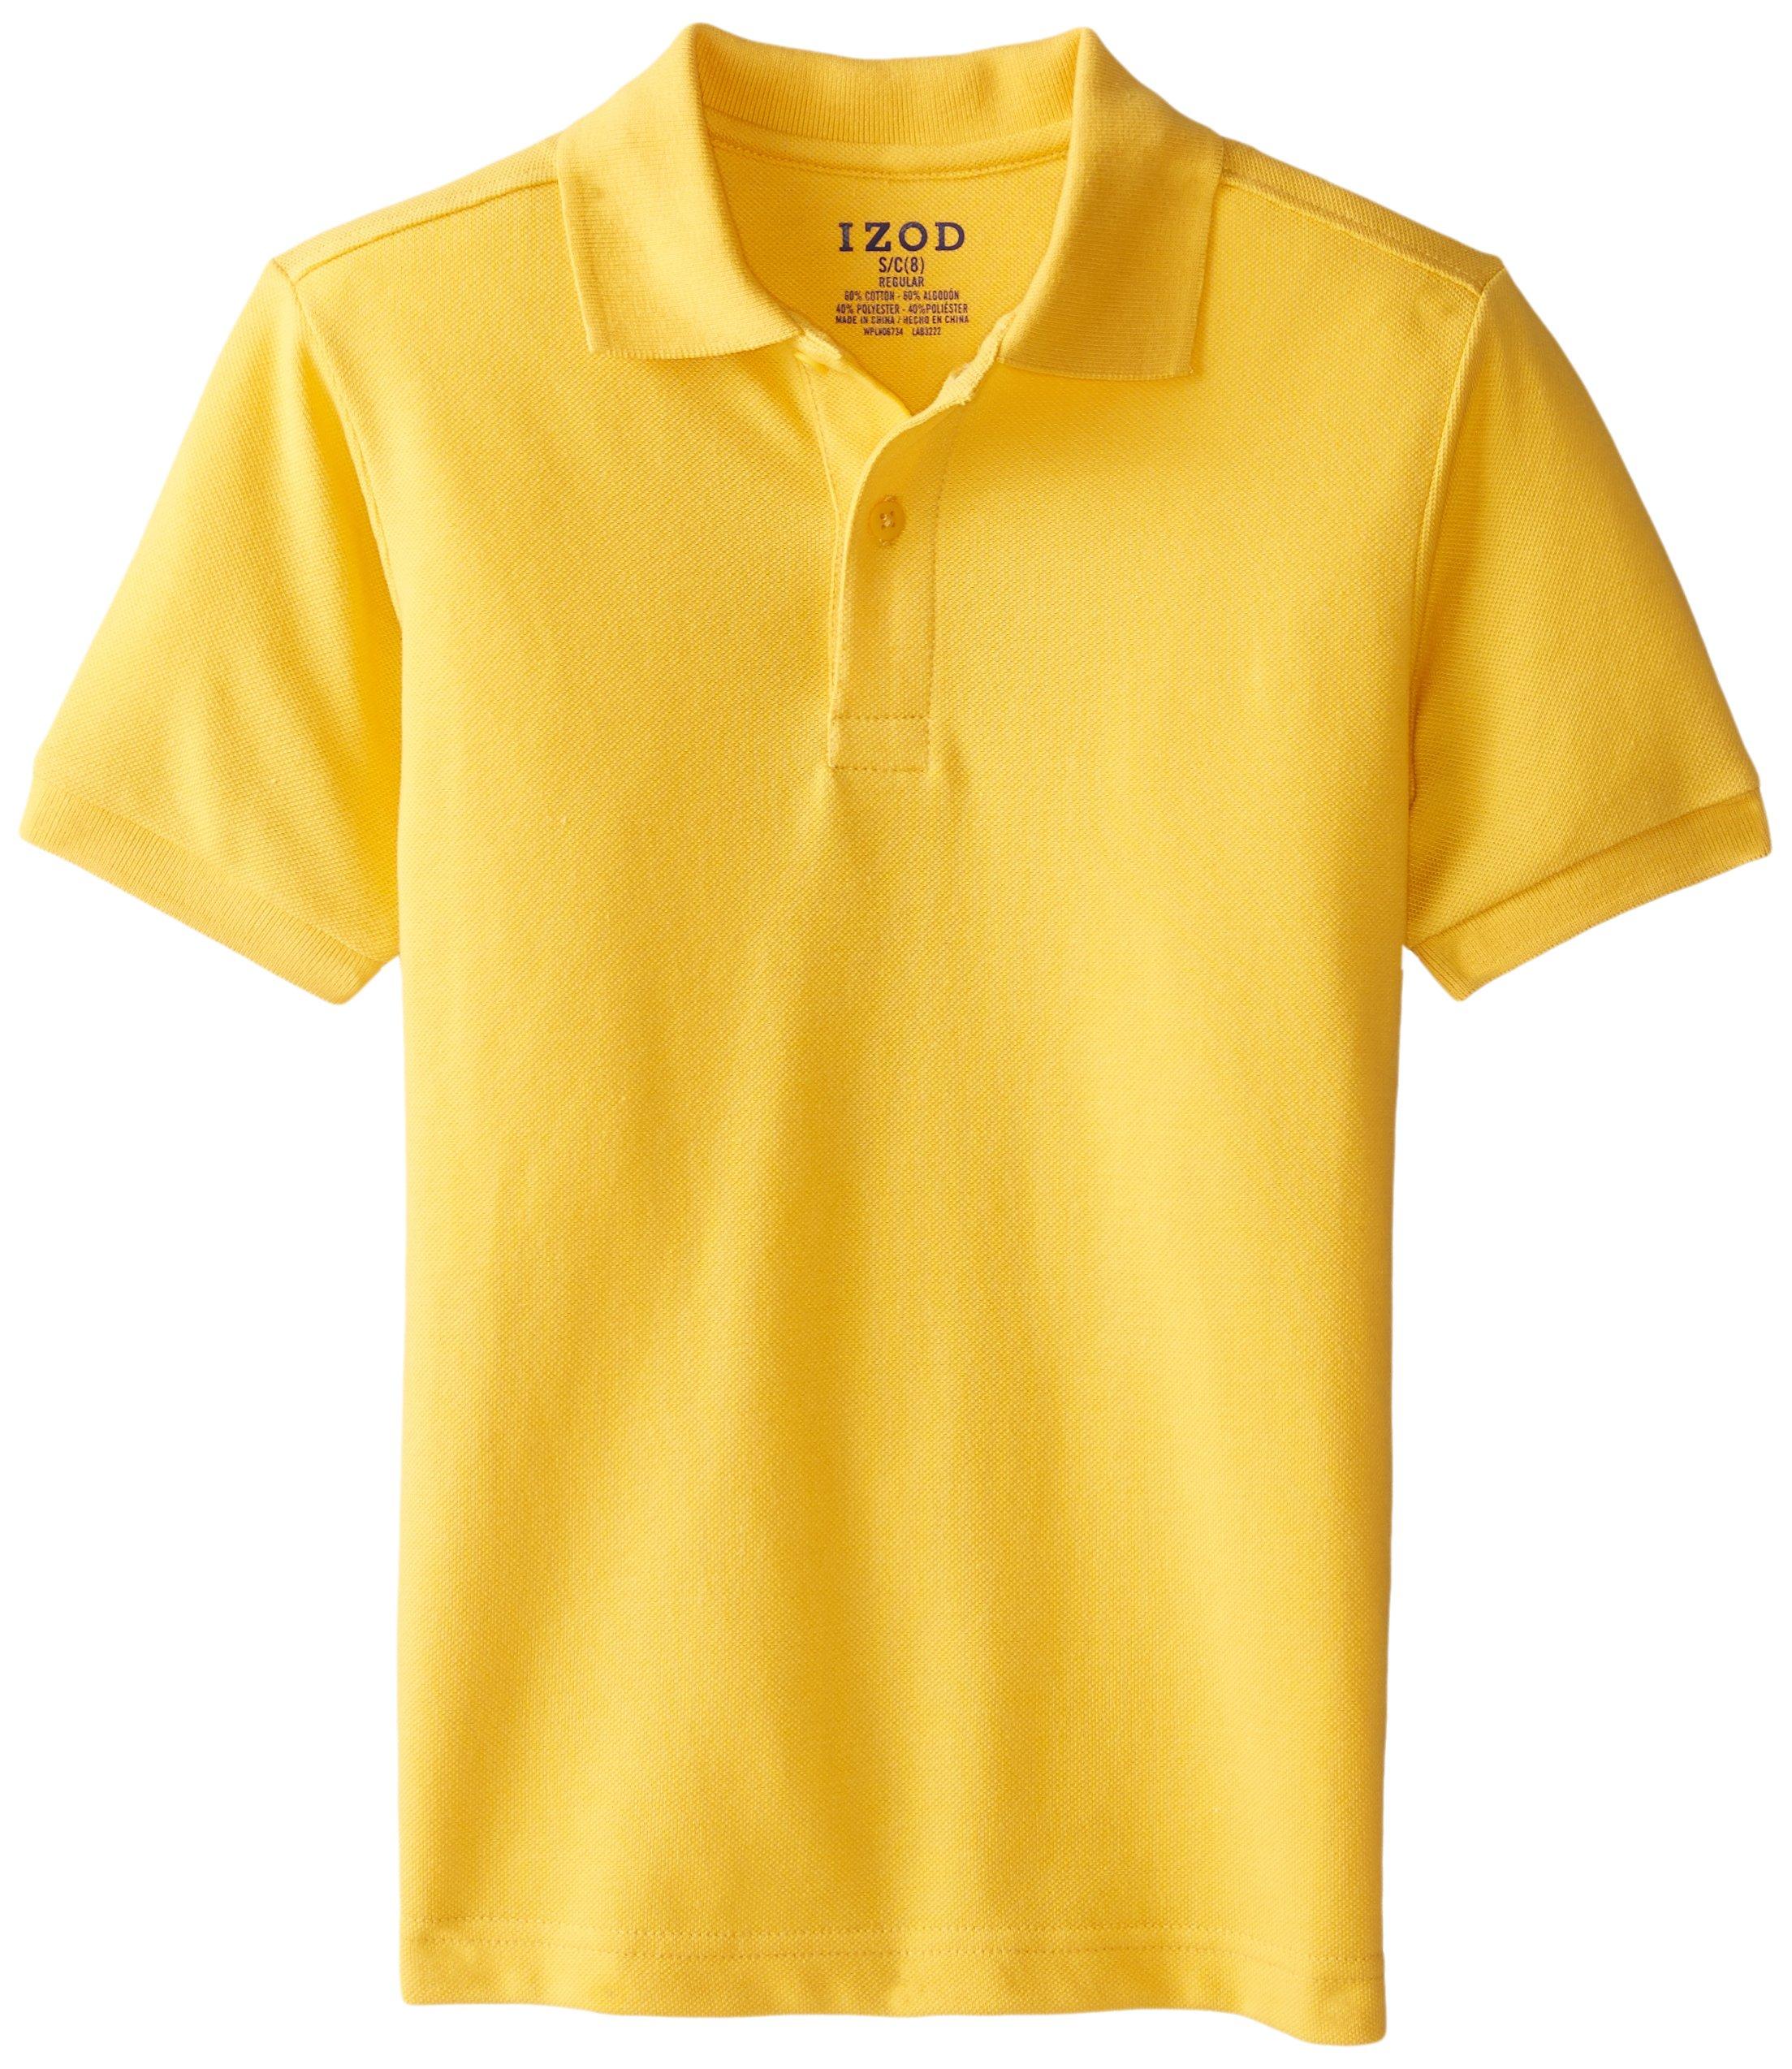 IZOD Big Boys' Short Sleeve Uniform Polo, Gold, Small